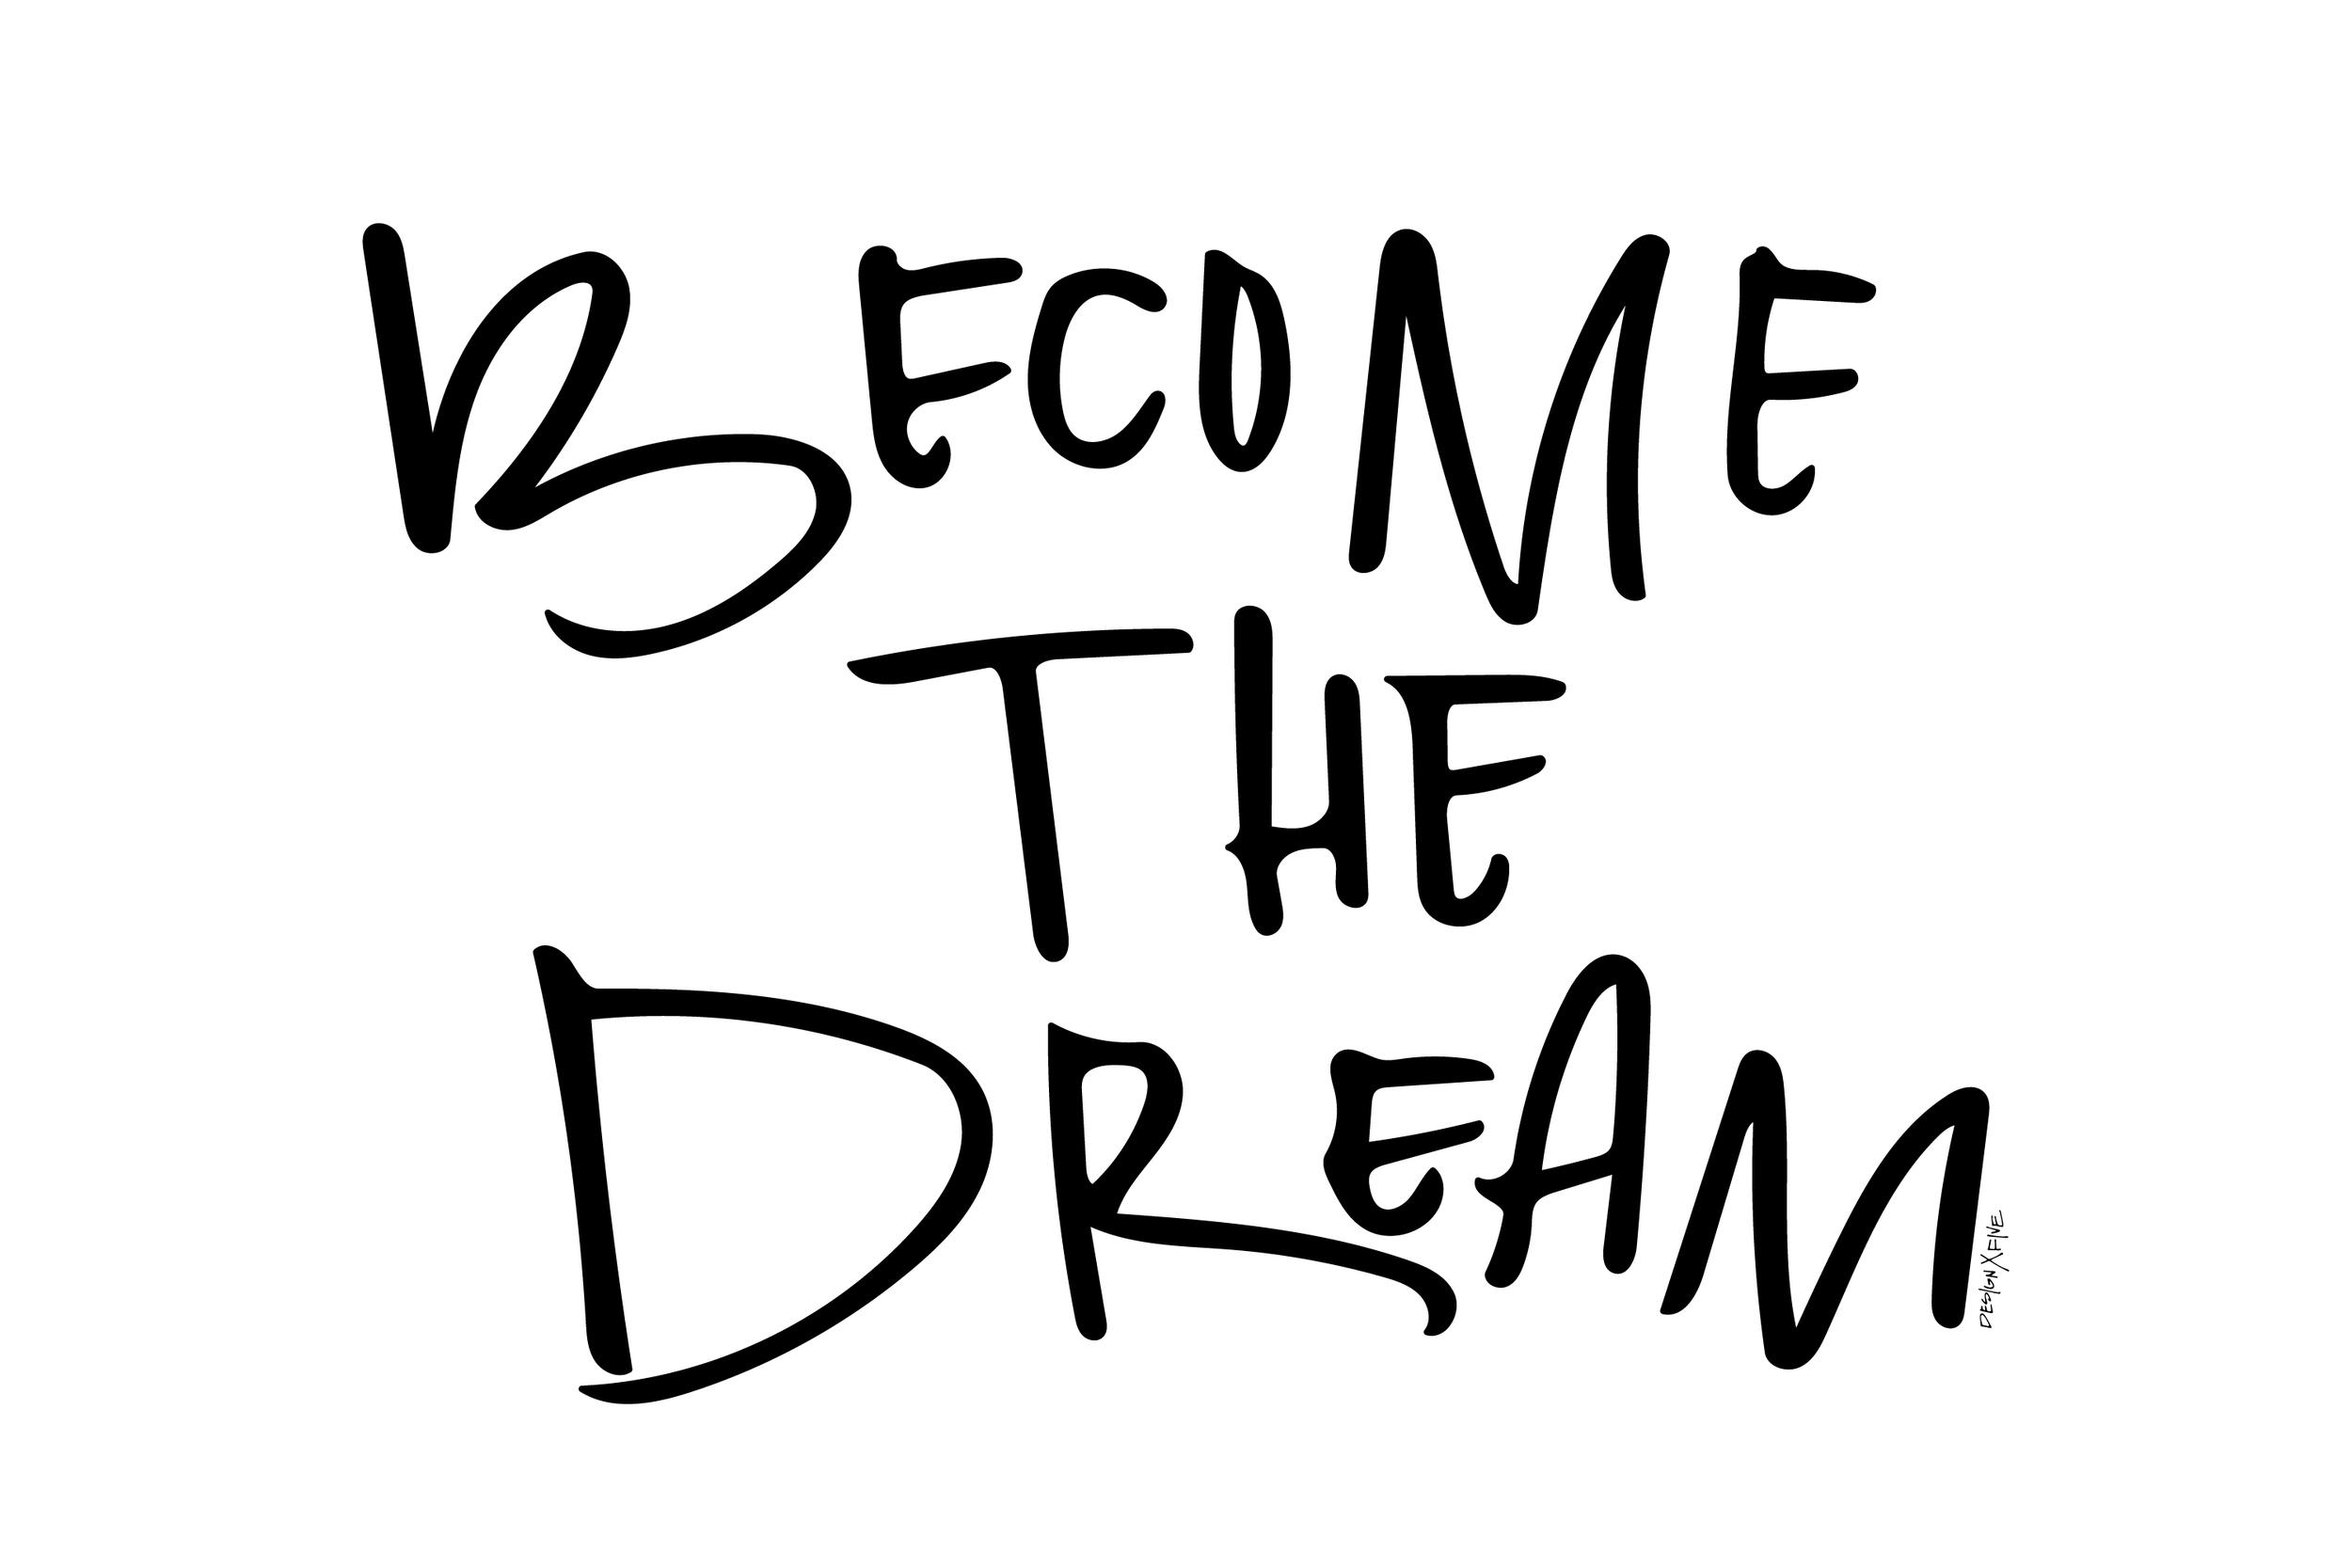 become-the-dream-lettering-design-x-five